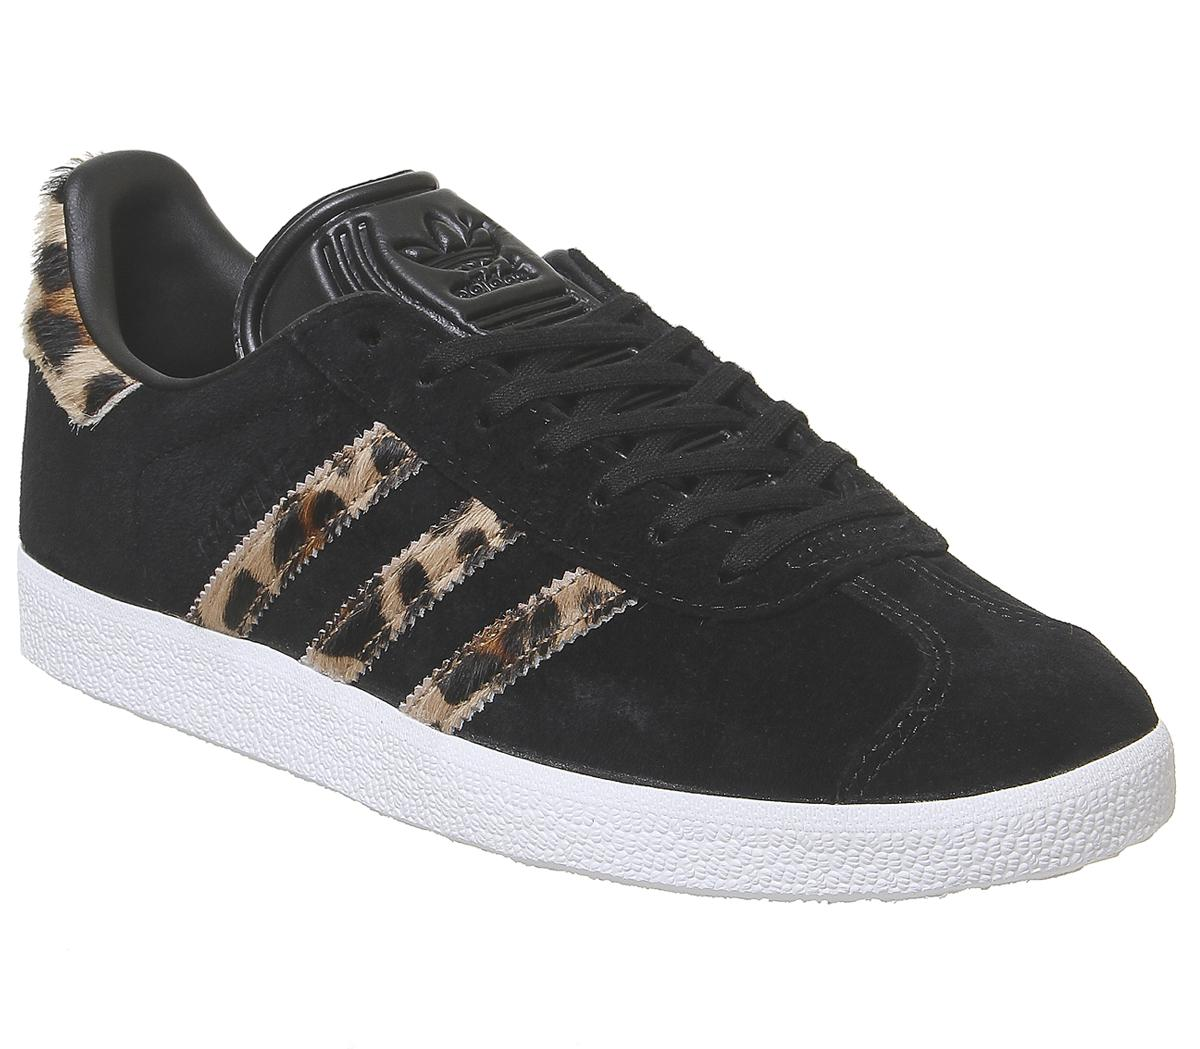 adidas gazelle size 5 sale